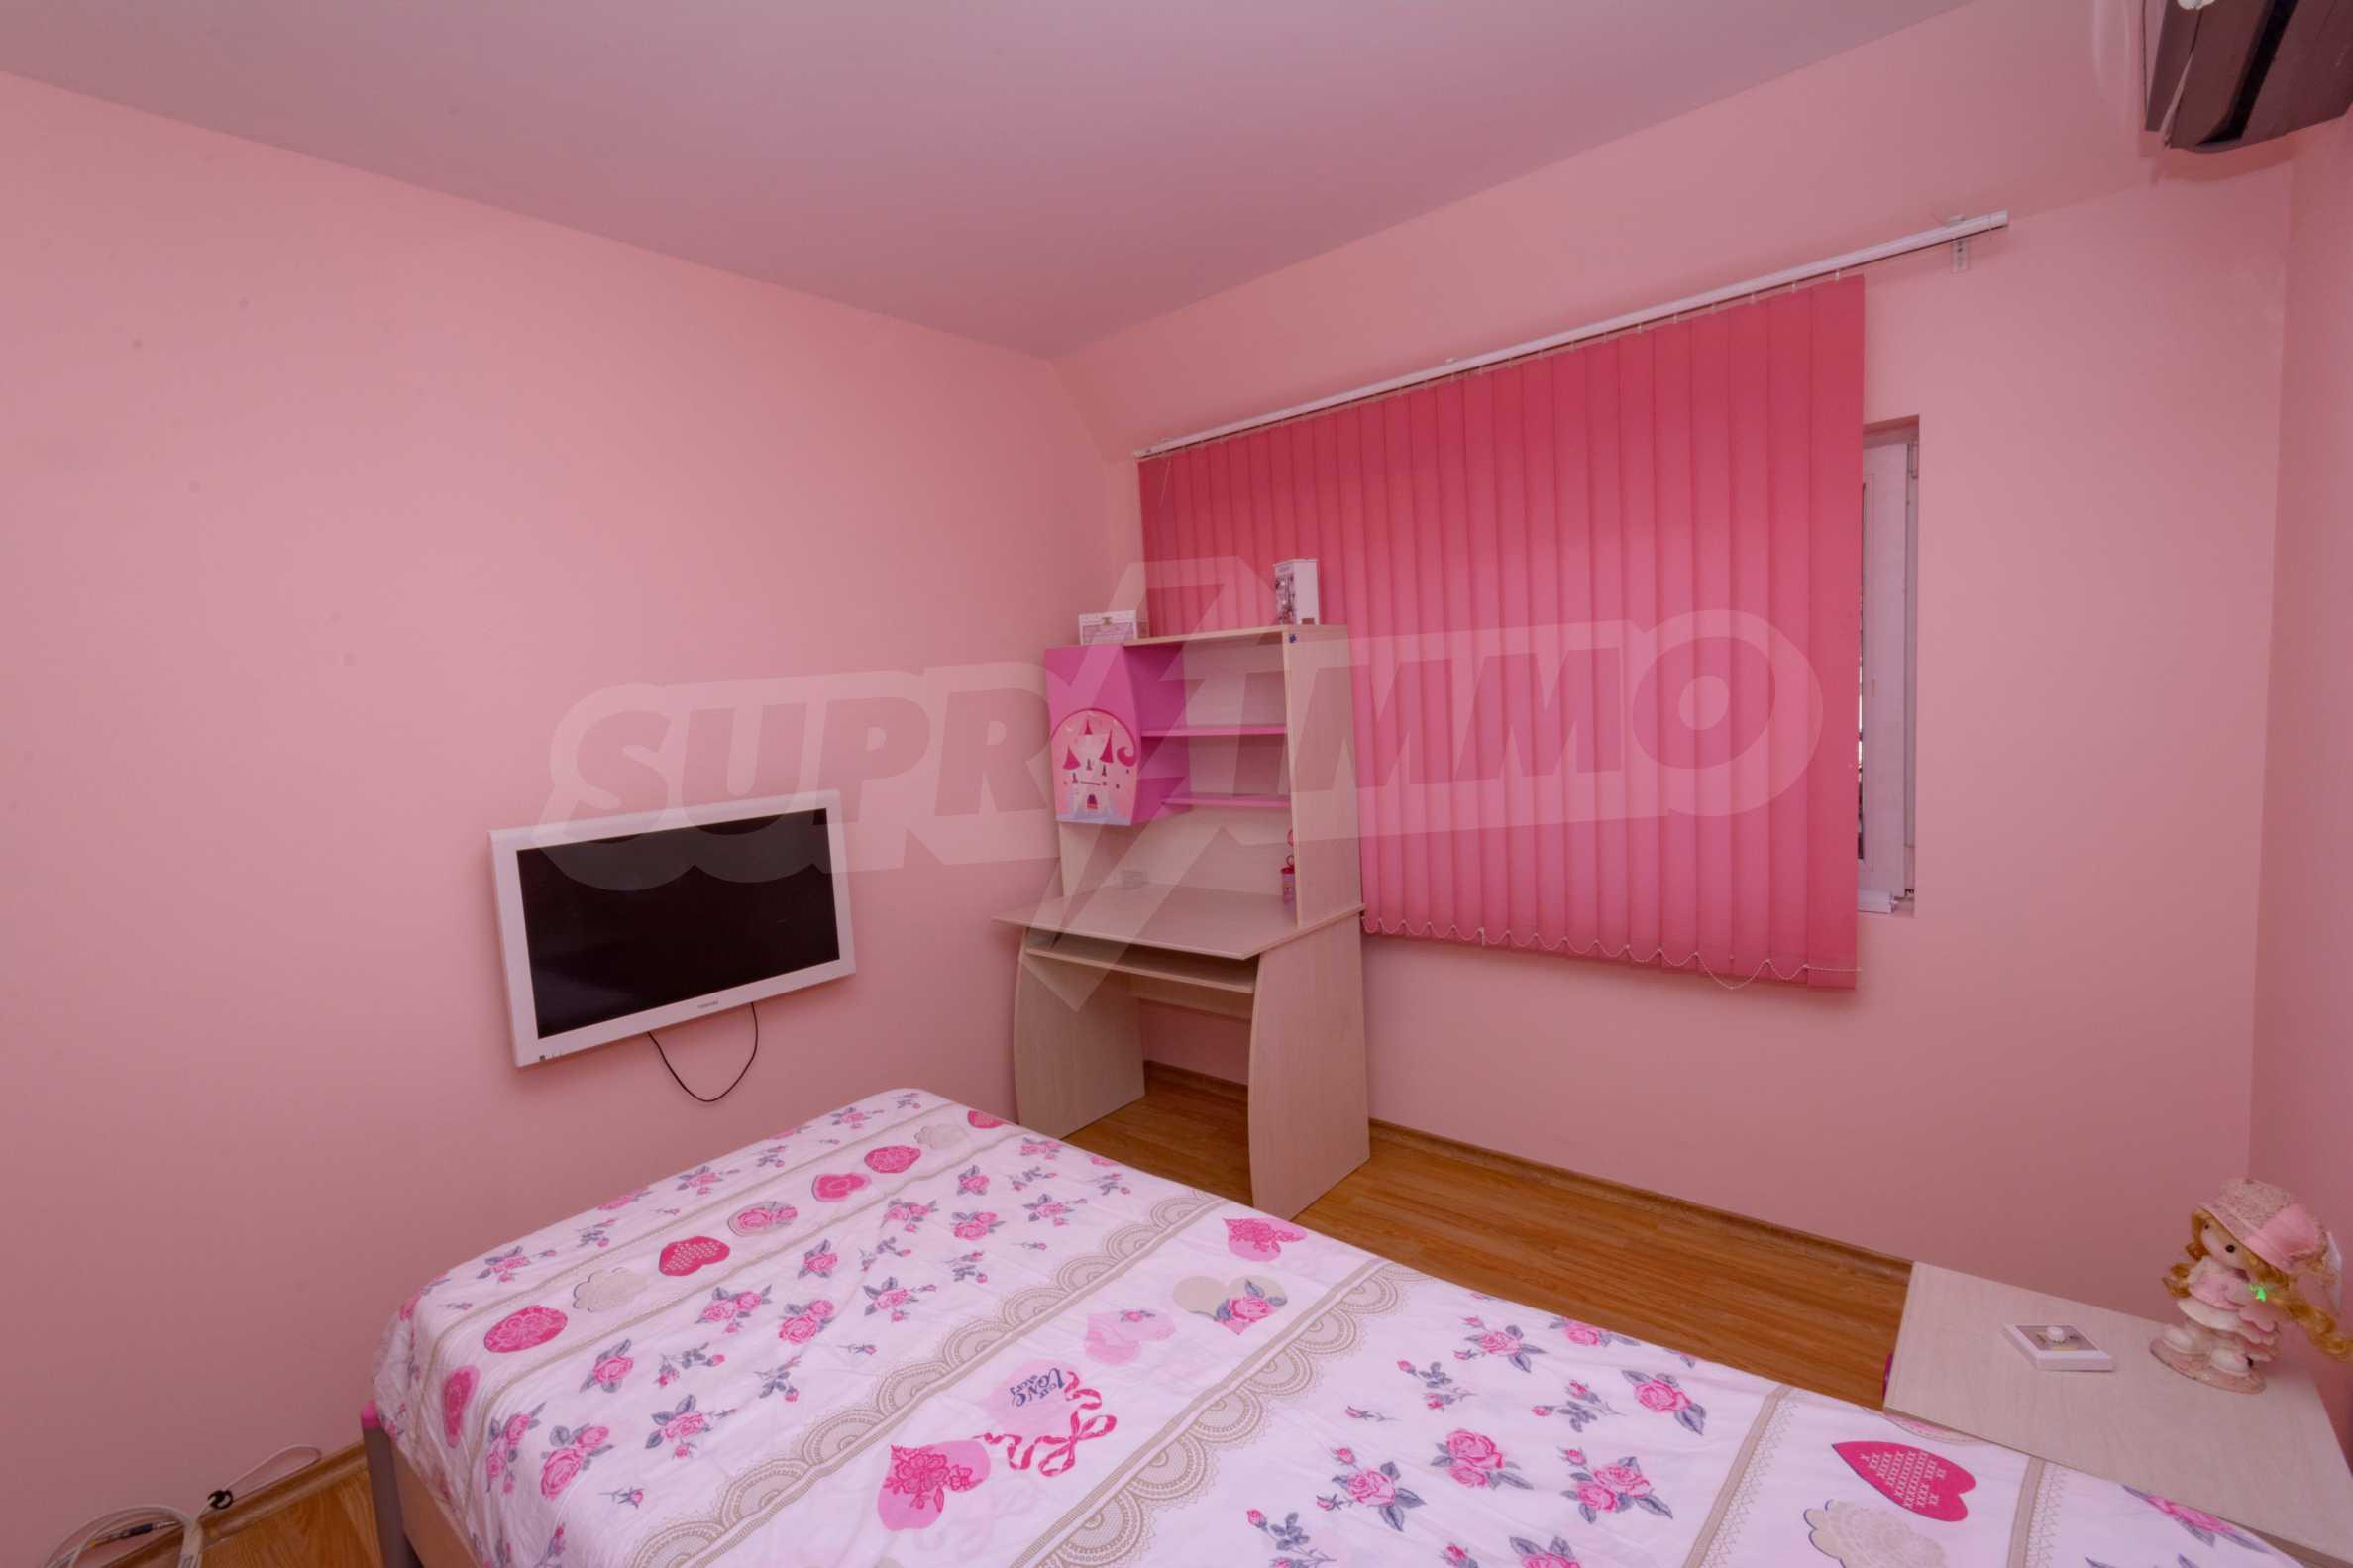 Многостаен апартамент до Гранд Хотел Пловдив 2